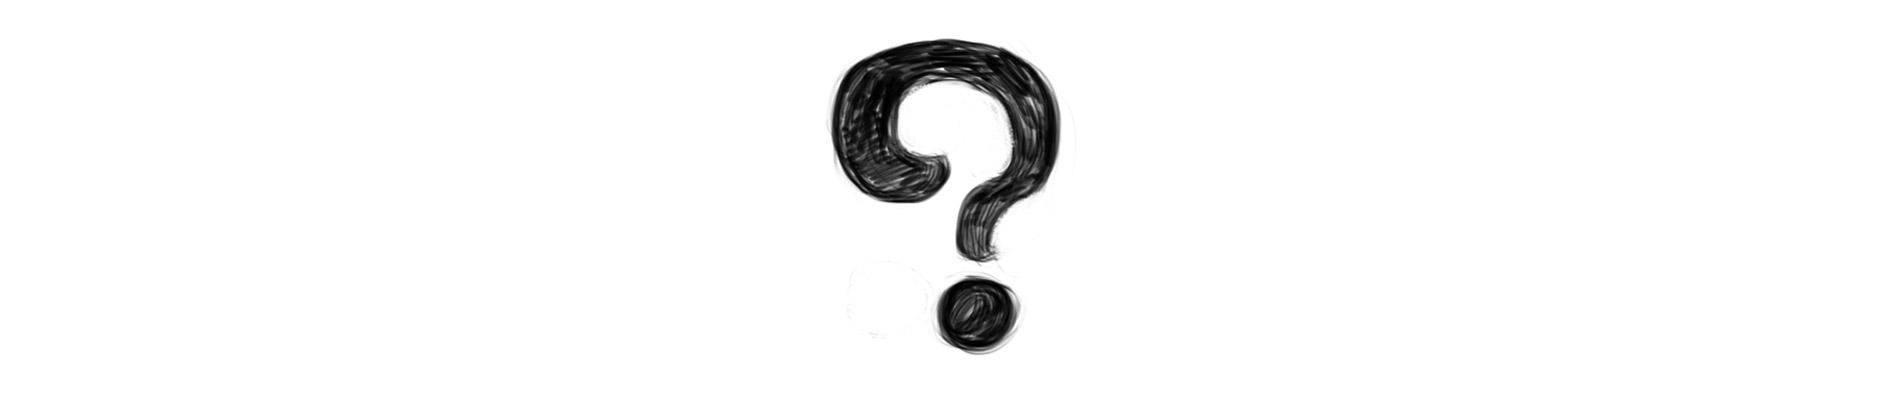 icon_question_01